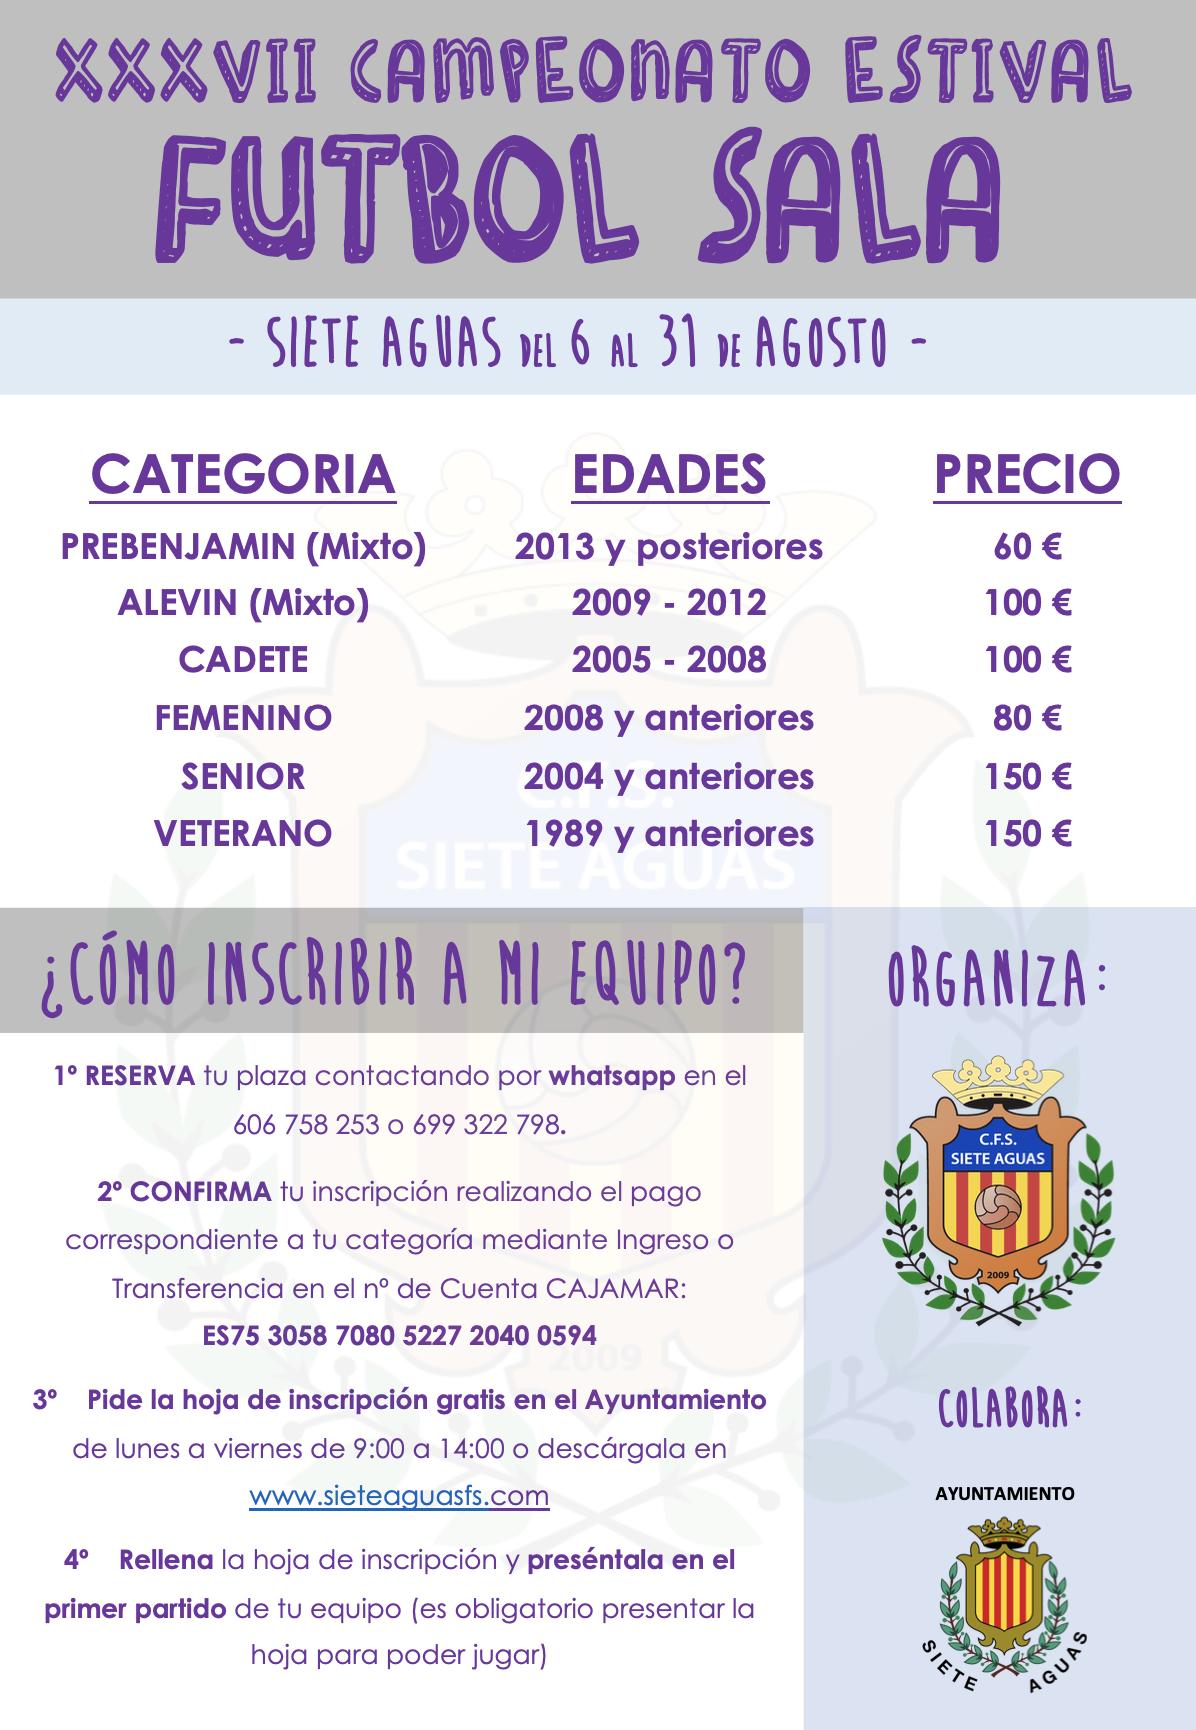 XXXVII Campeonato Estival Fútbol Sala